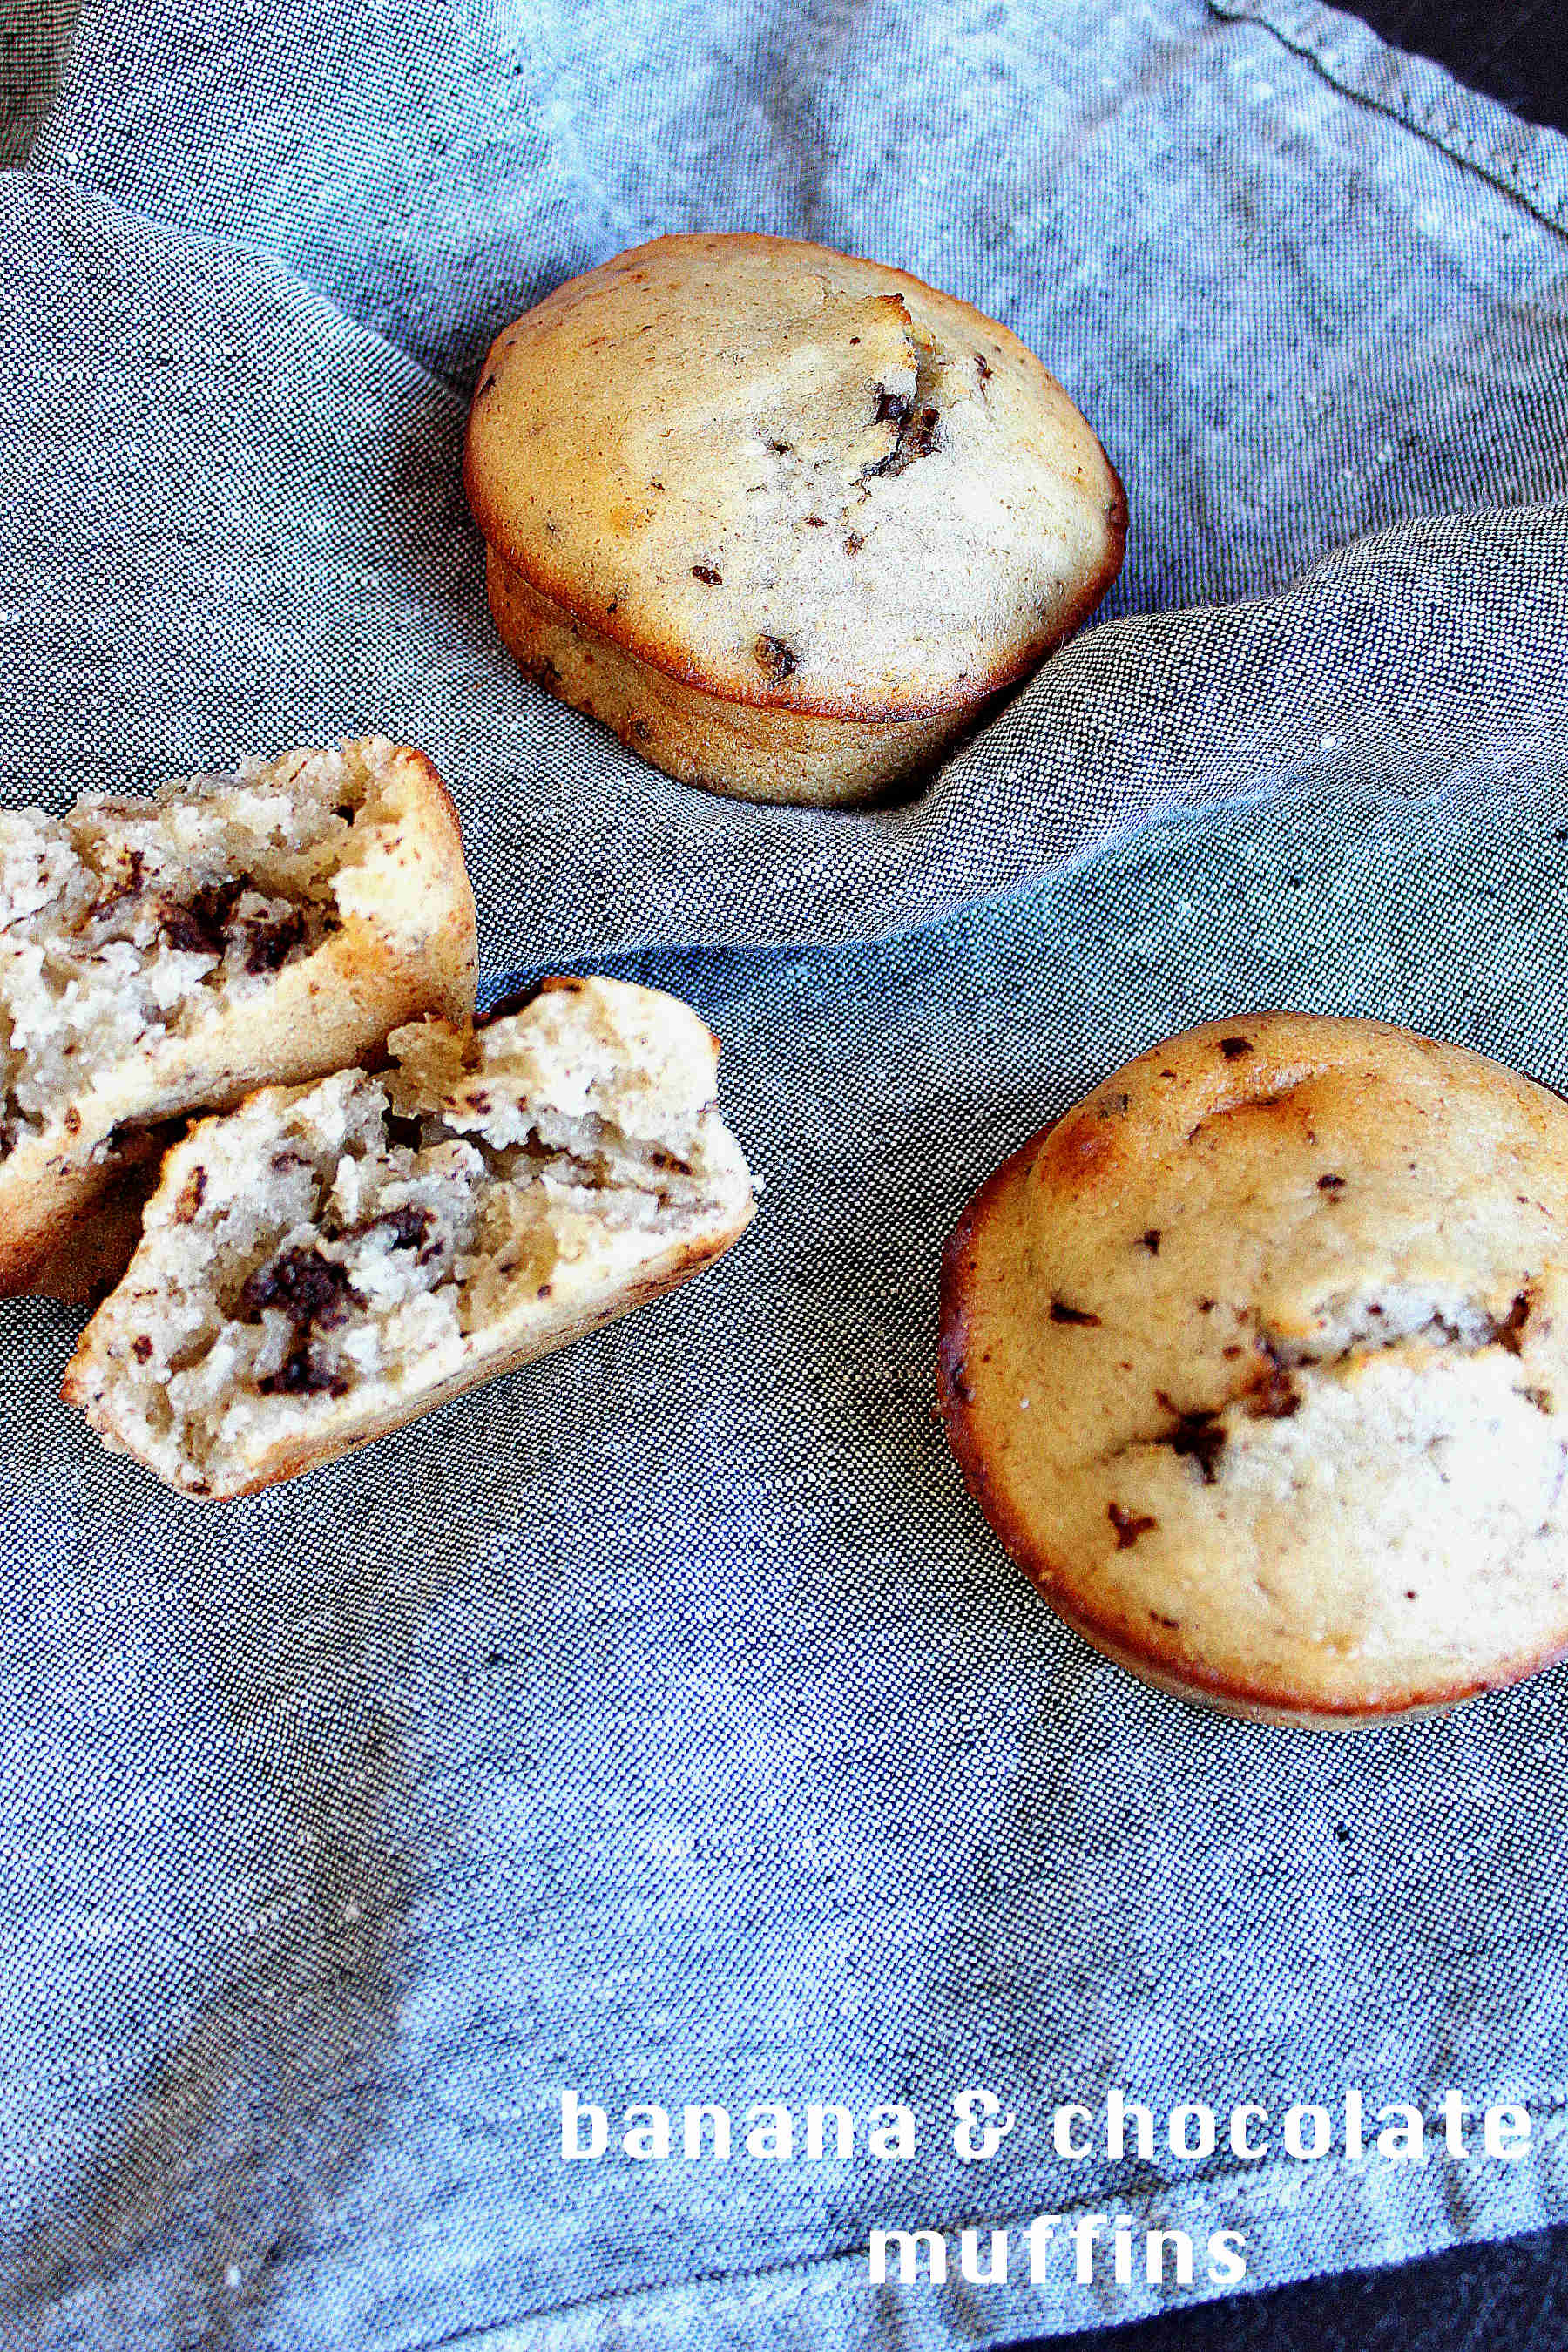 The moistest banana + chocolate chips muffins